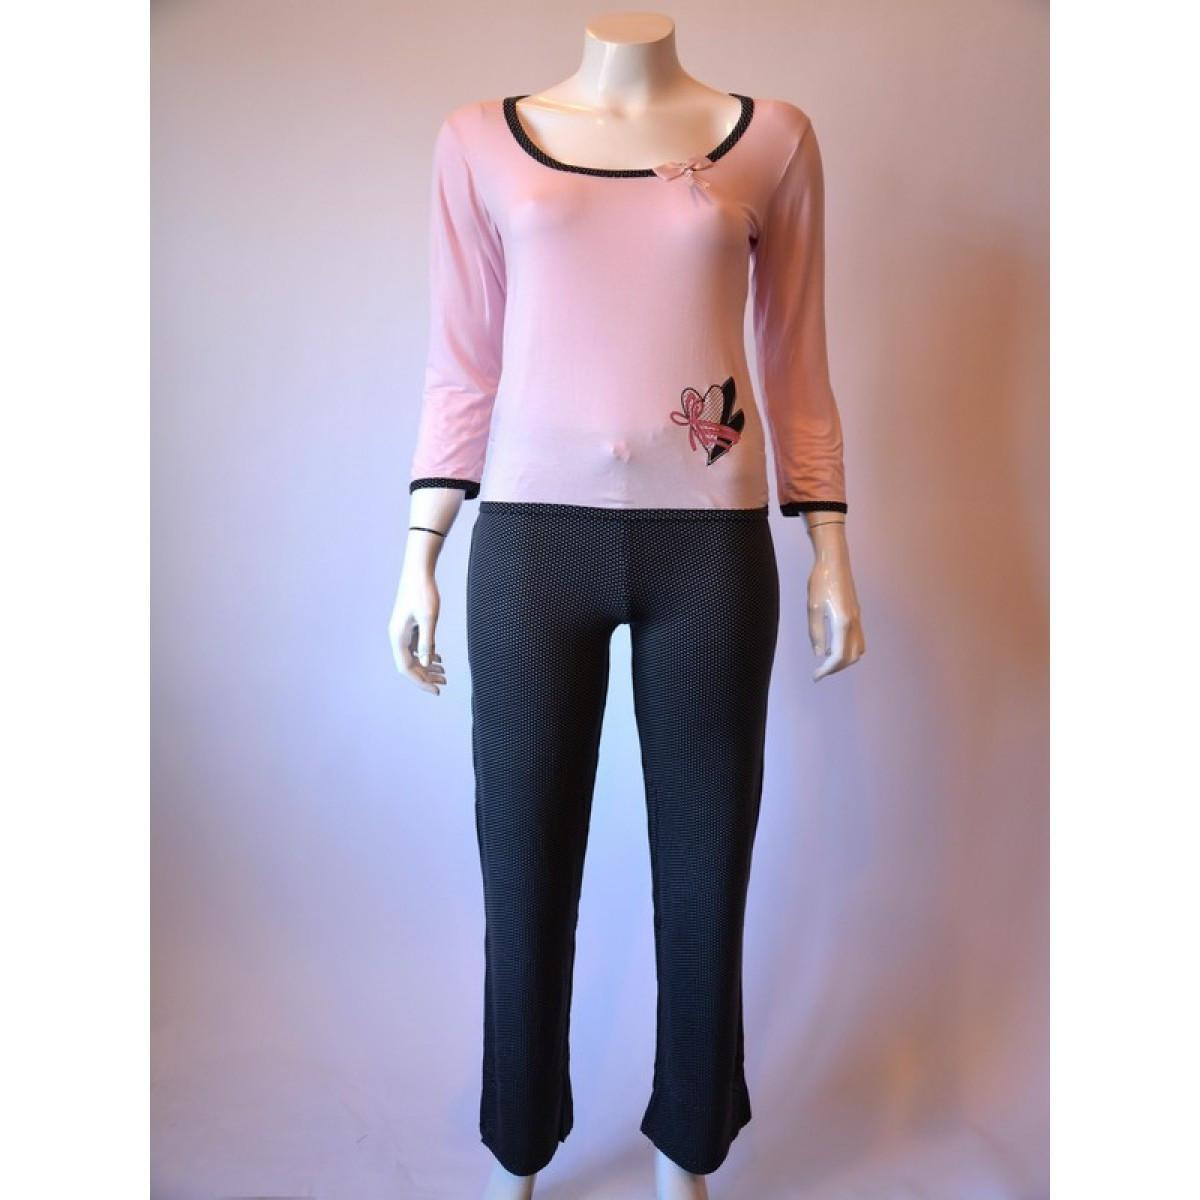 Dámské pyžamo 595 YPJ - CoCoon Barva: růžova, Velikost: XL